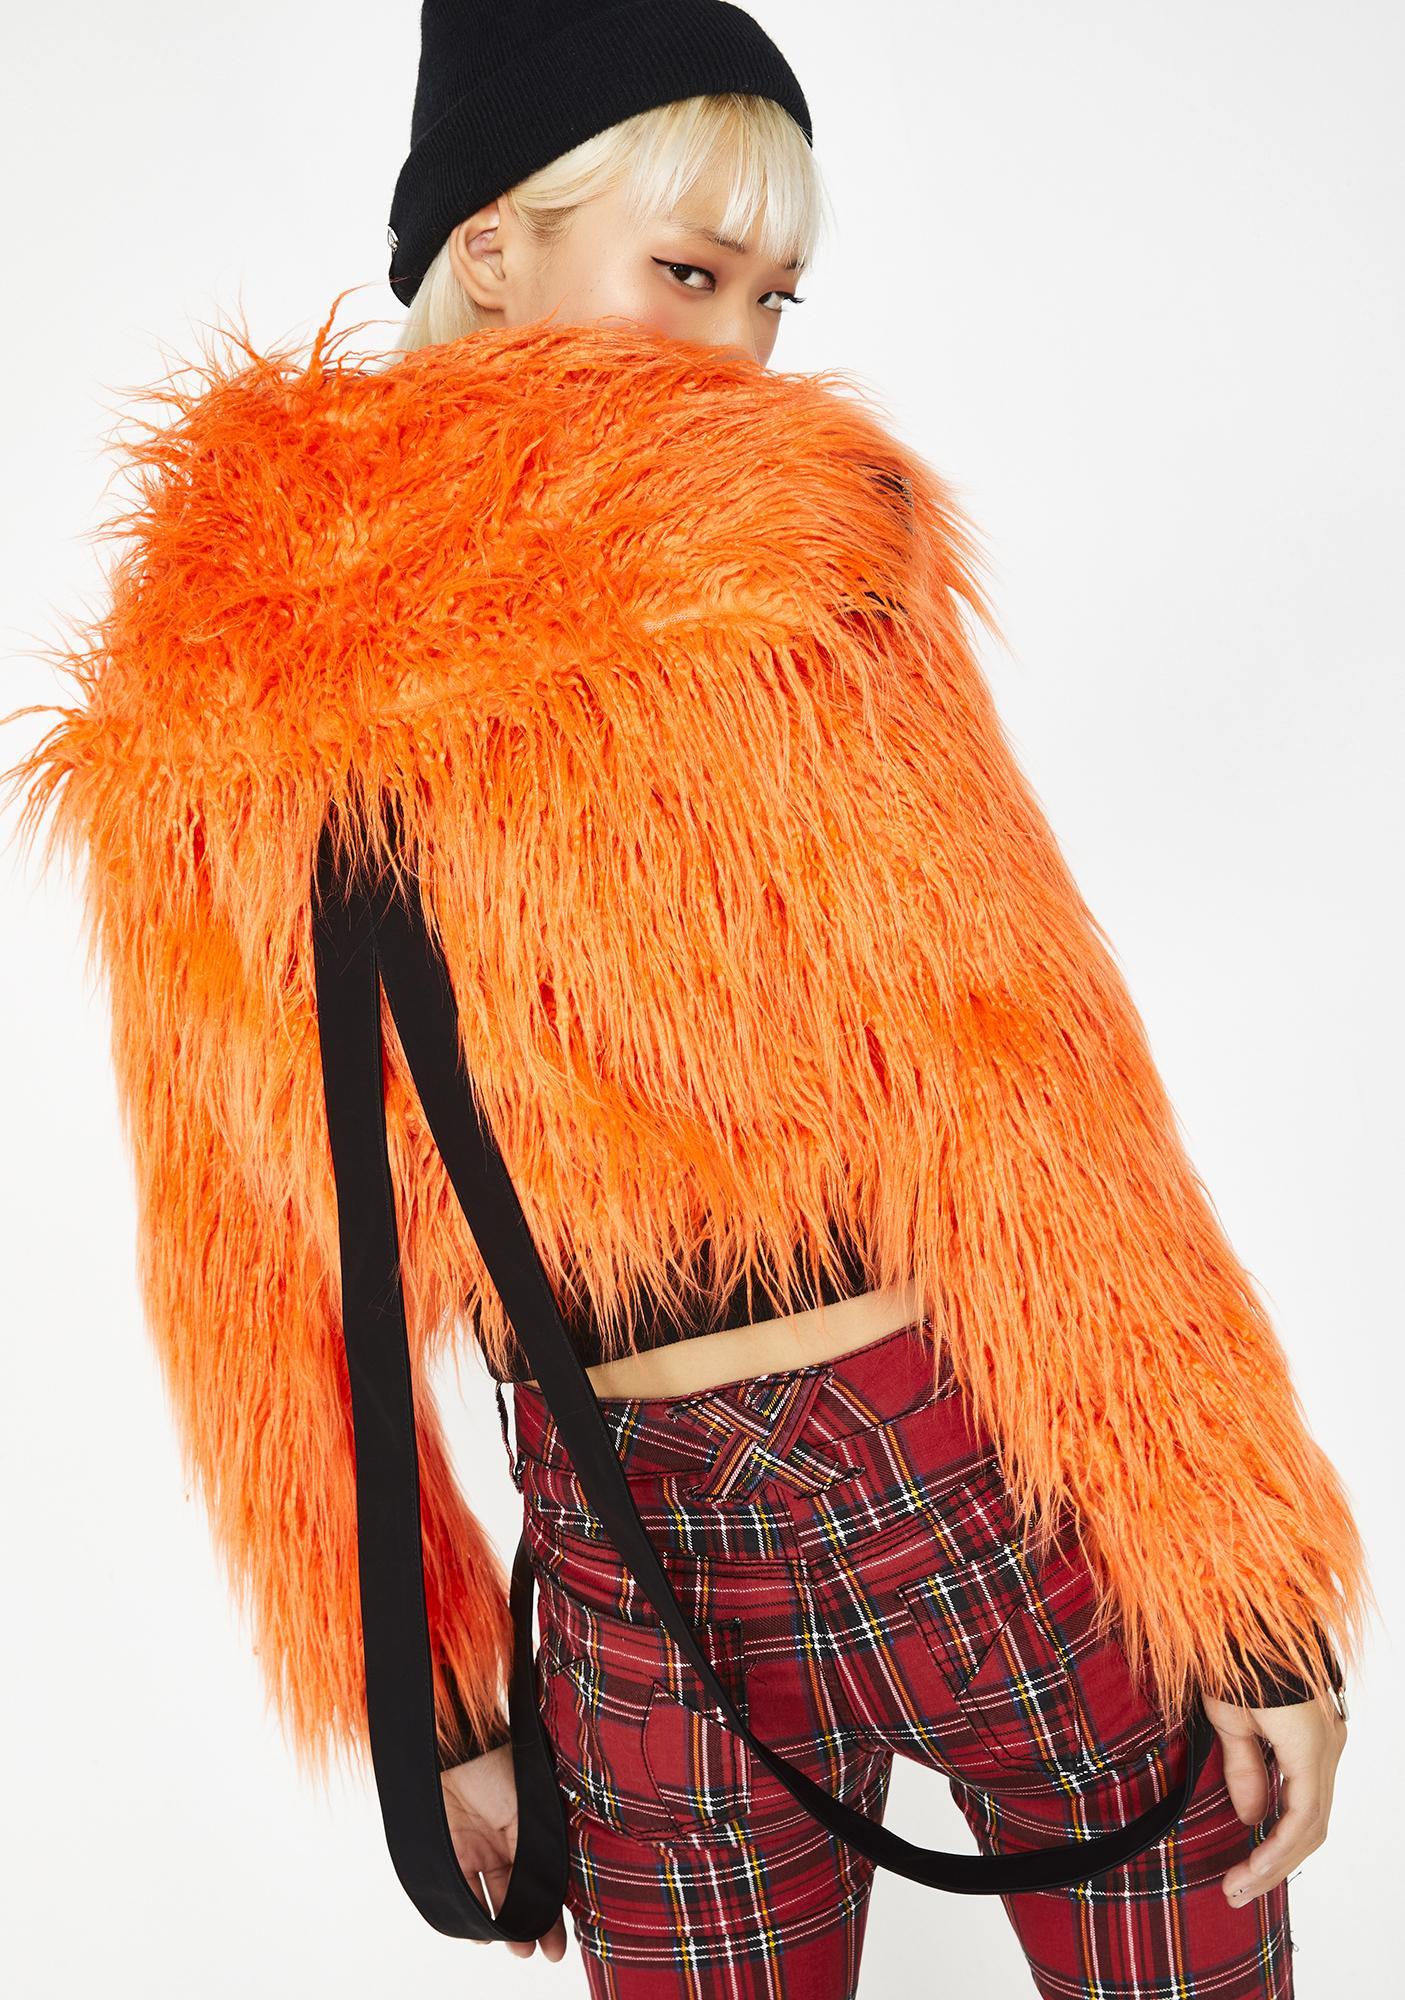 Current Mood Vibrant Chaos Fuzzy Jacket